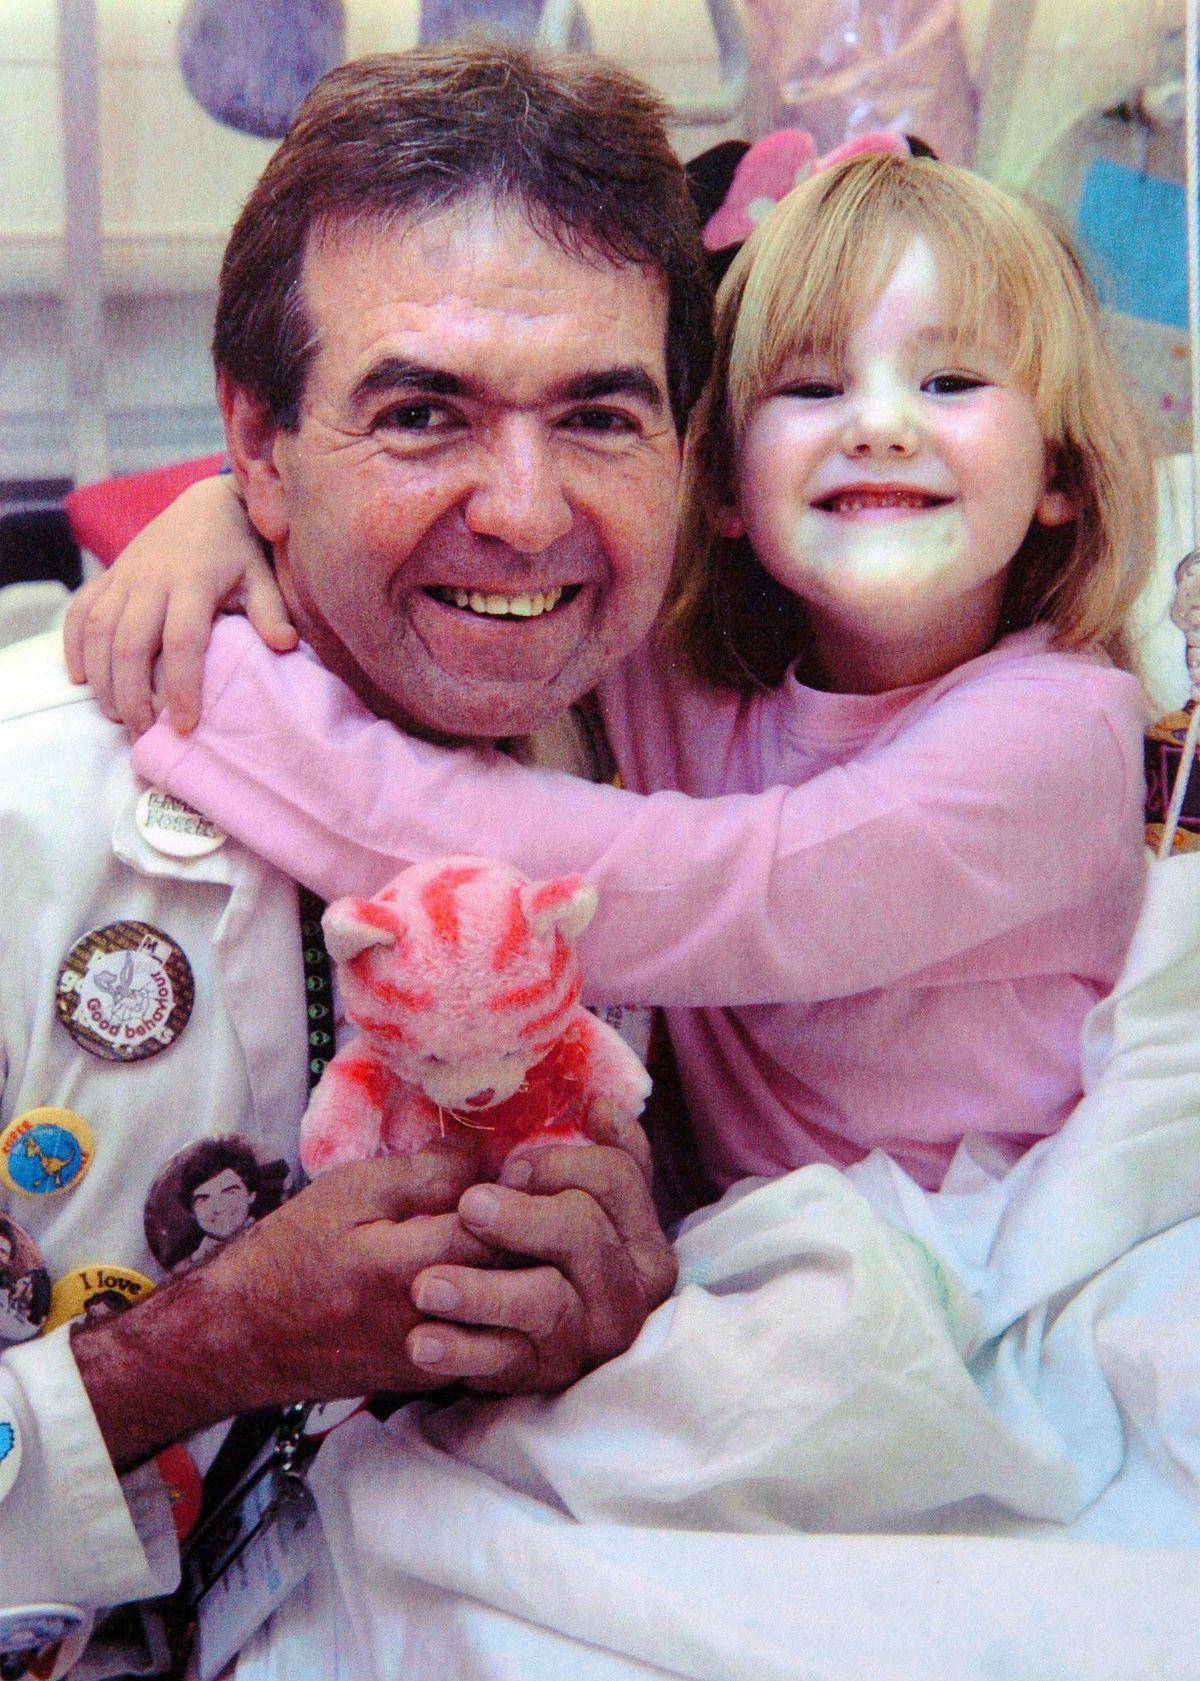 Steve Ford helped hundreds of children over the years